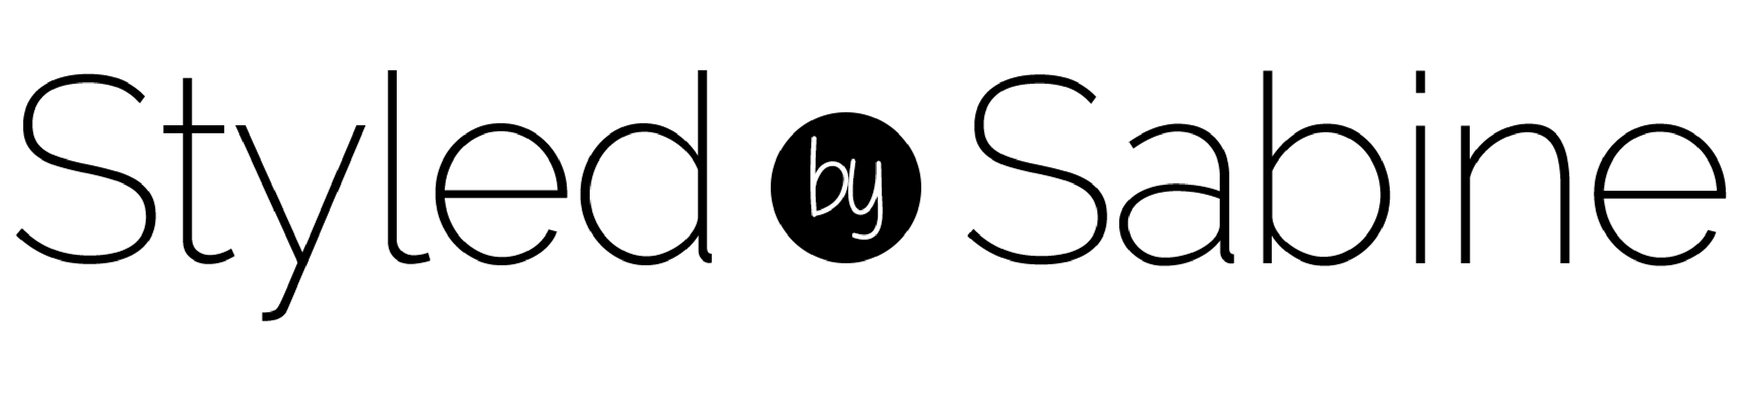 Styled by Sabine Logo